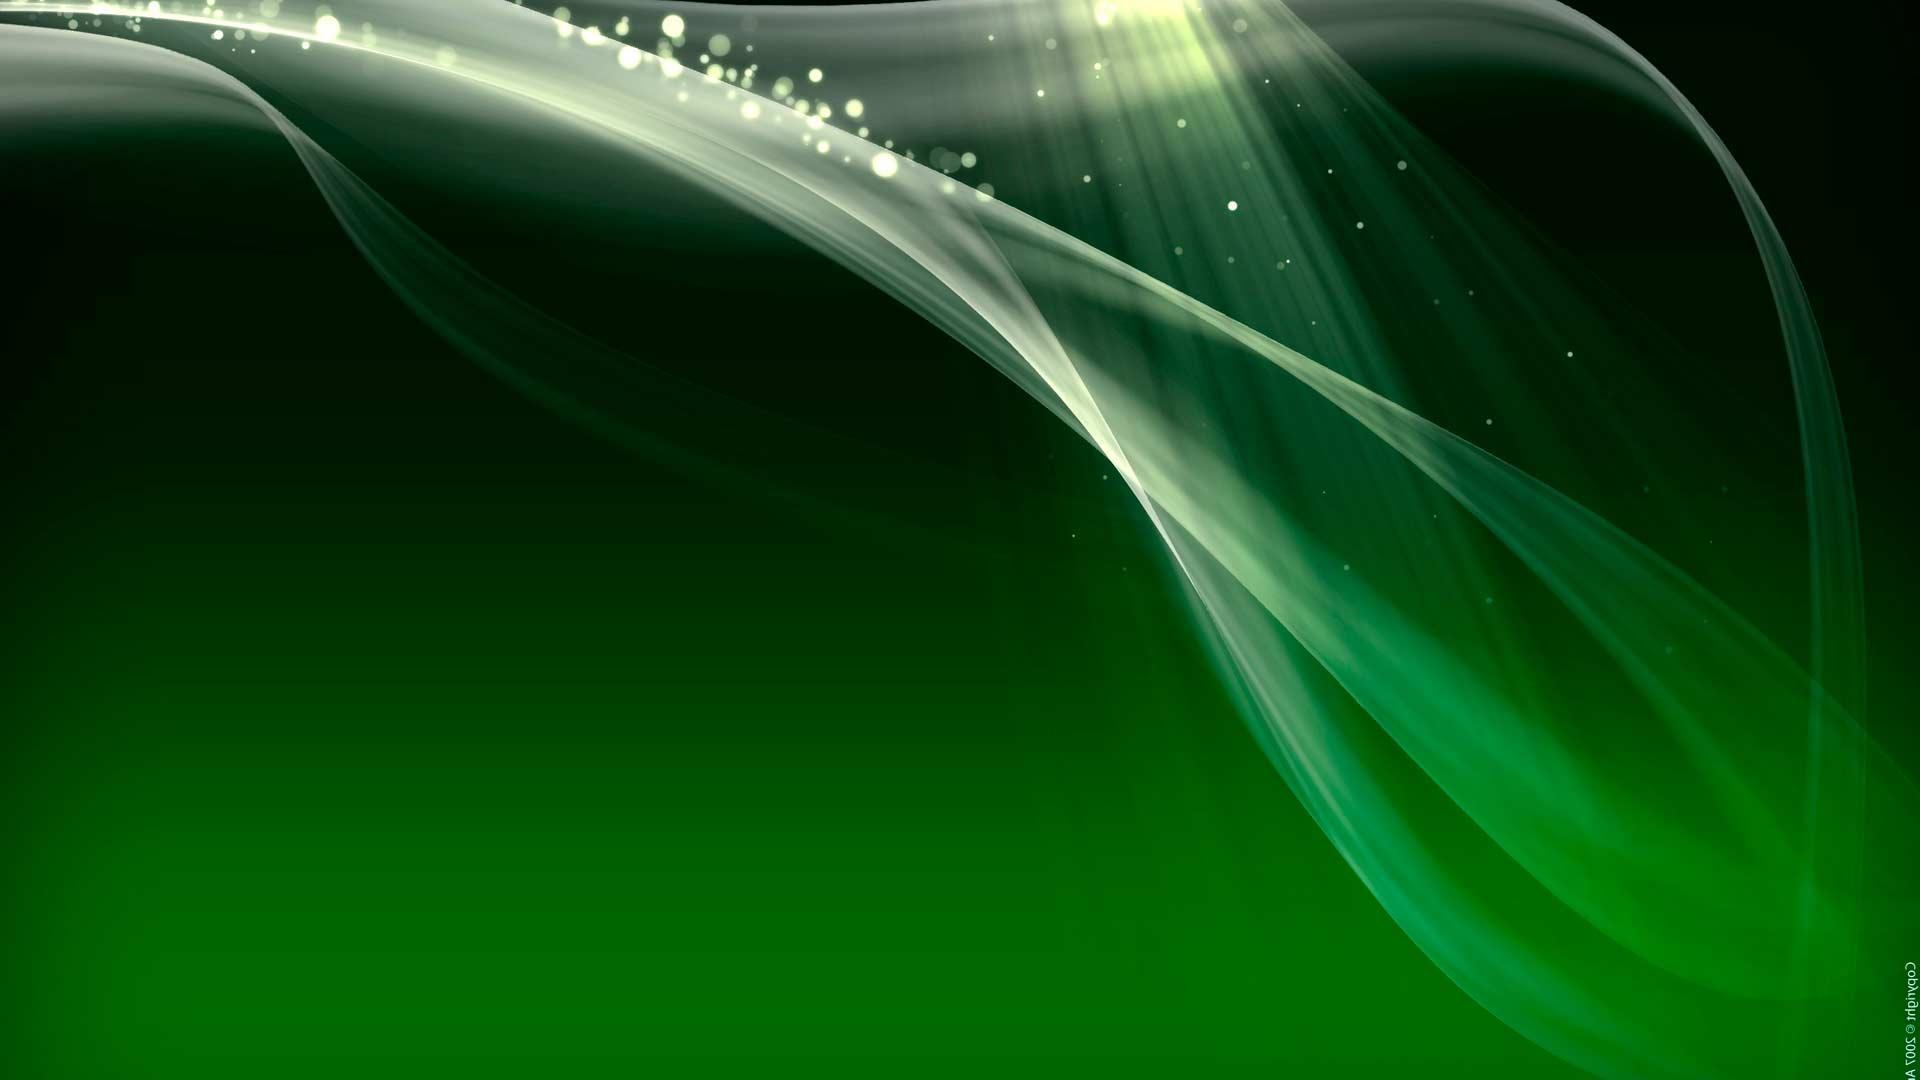 Обои Зеленая песня, картинки - Обои для ...: www.fullhdoboi.ru/photo/abstract/zelenaja_pesnja/22-0-26664